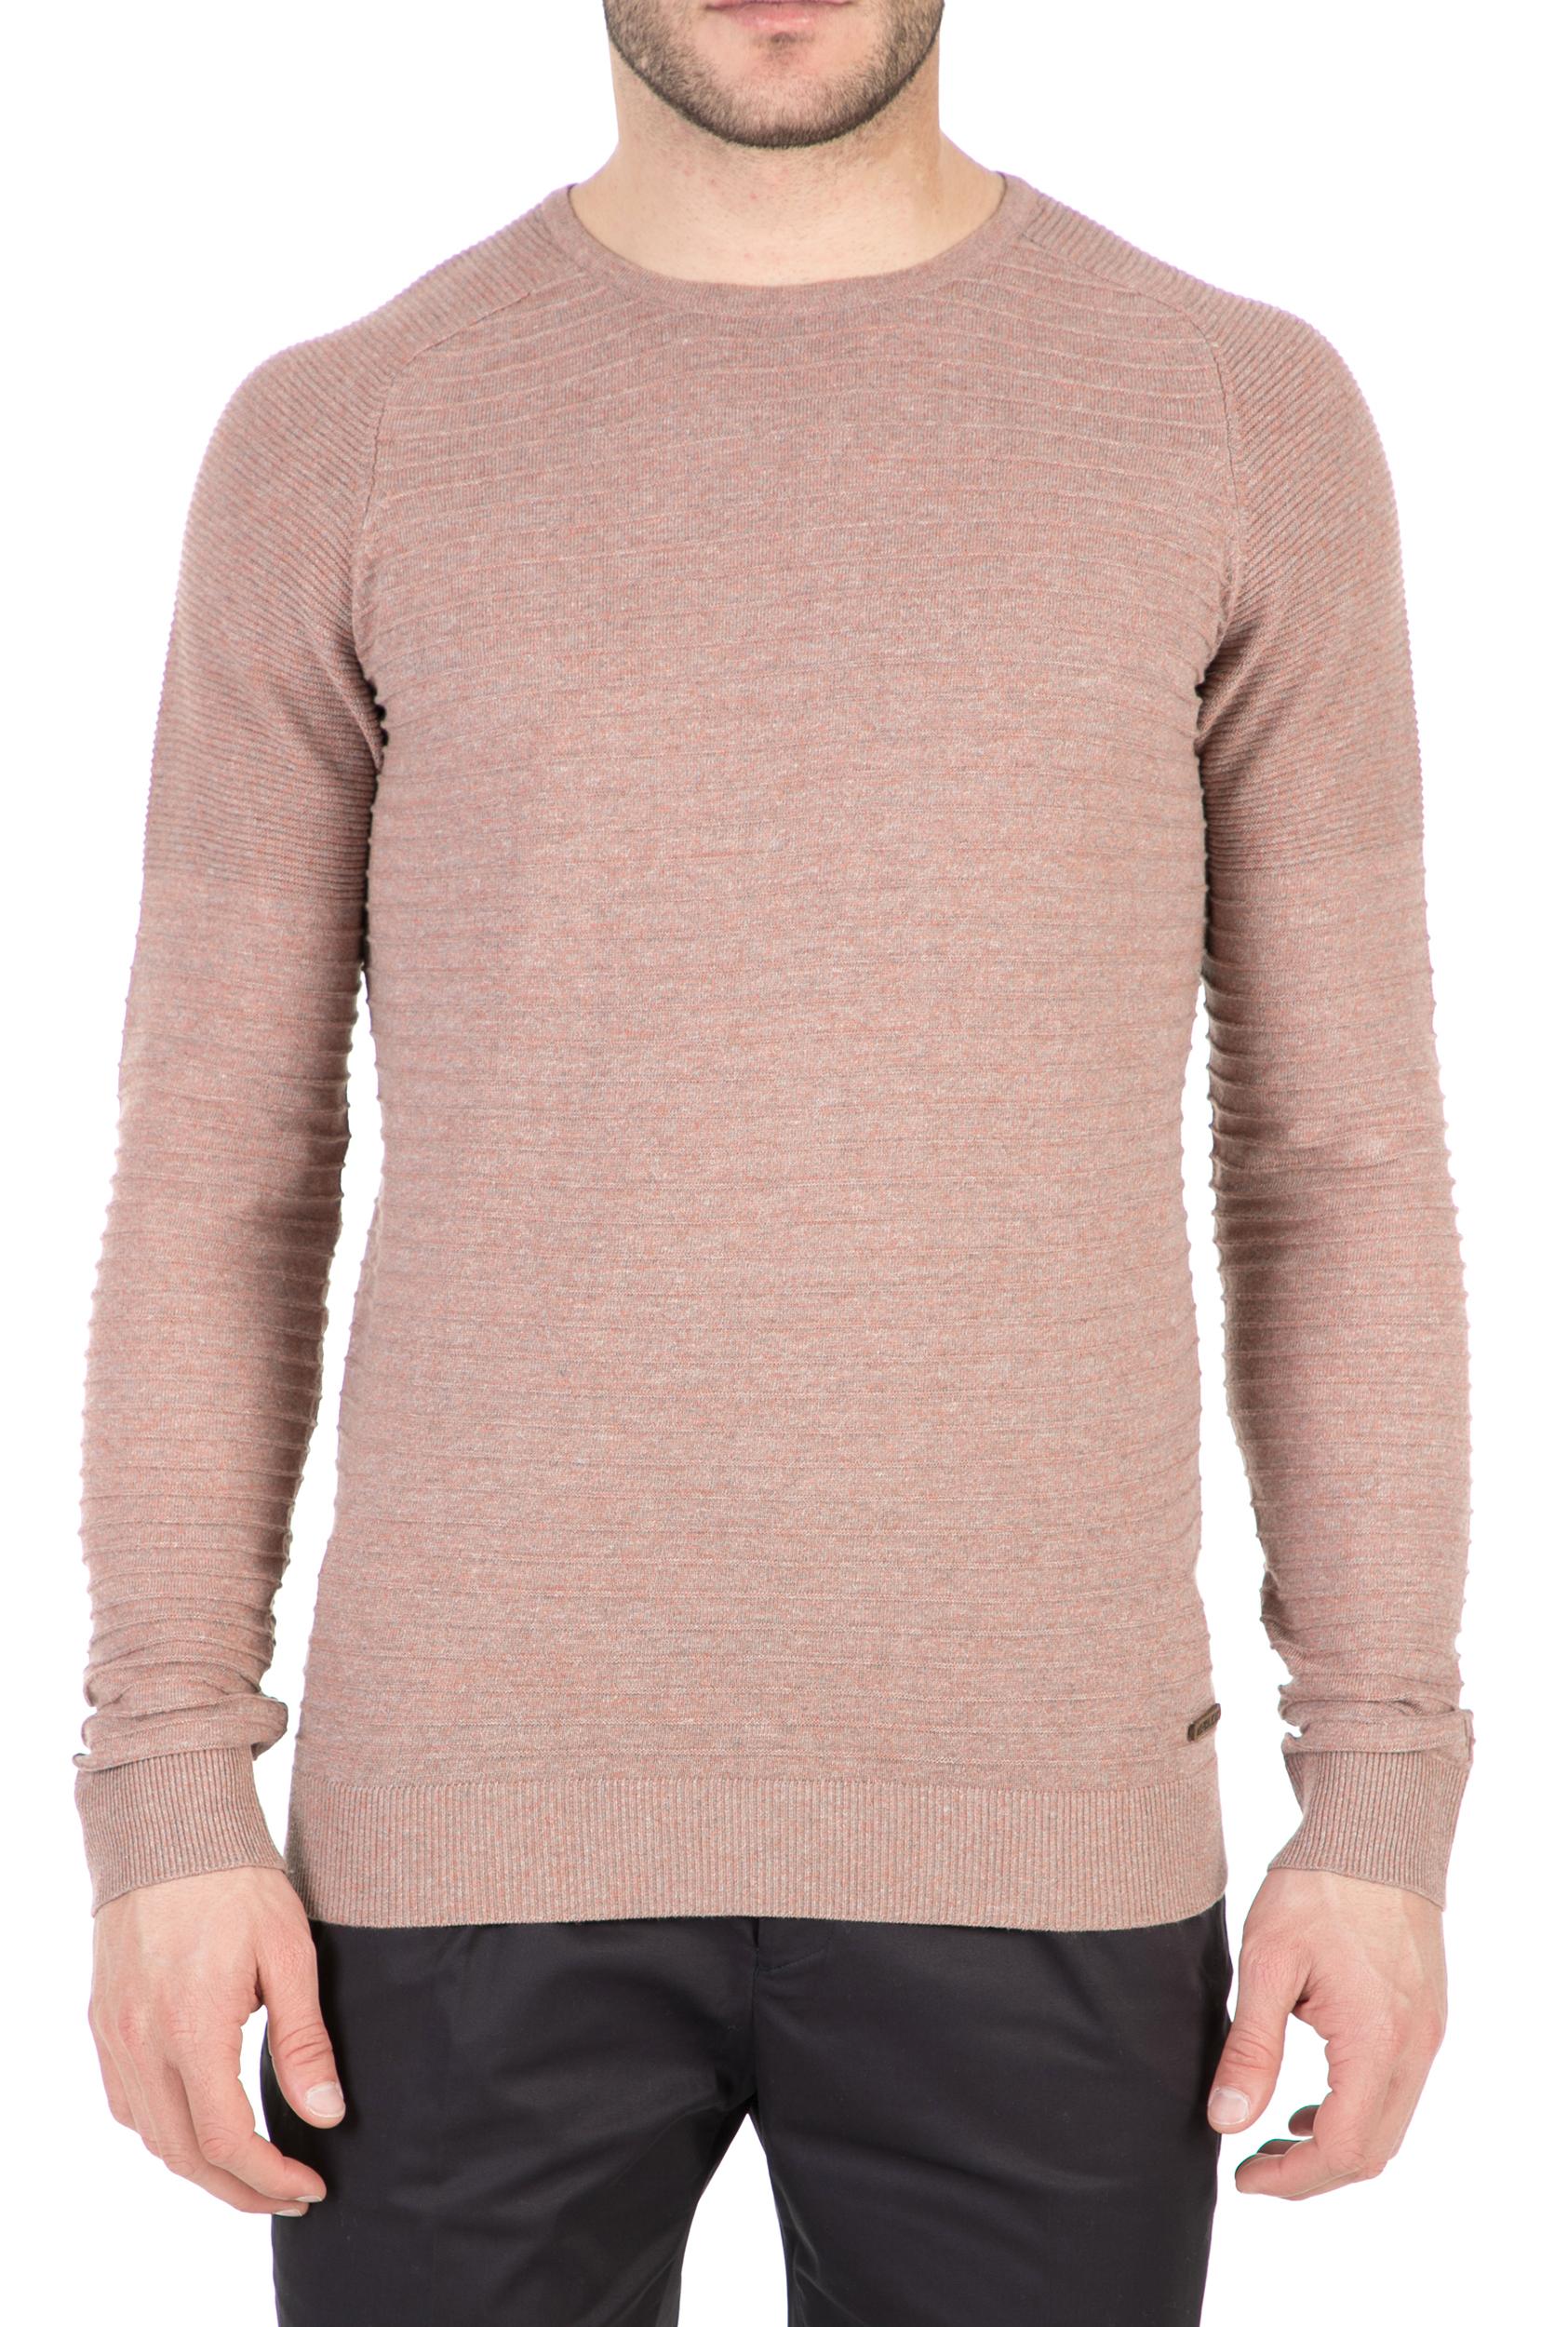 77e765392d79 GARCIA JEANS - Ανδρική μακρυμάνικη μπλούζα GARCIA JEANS ροζ